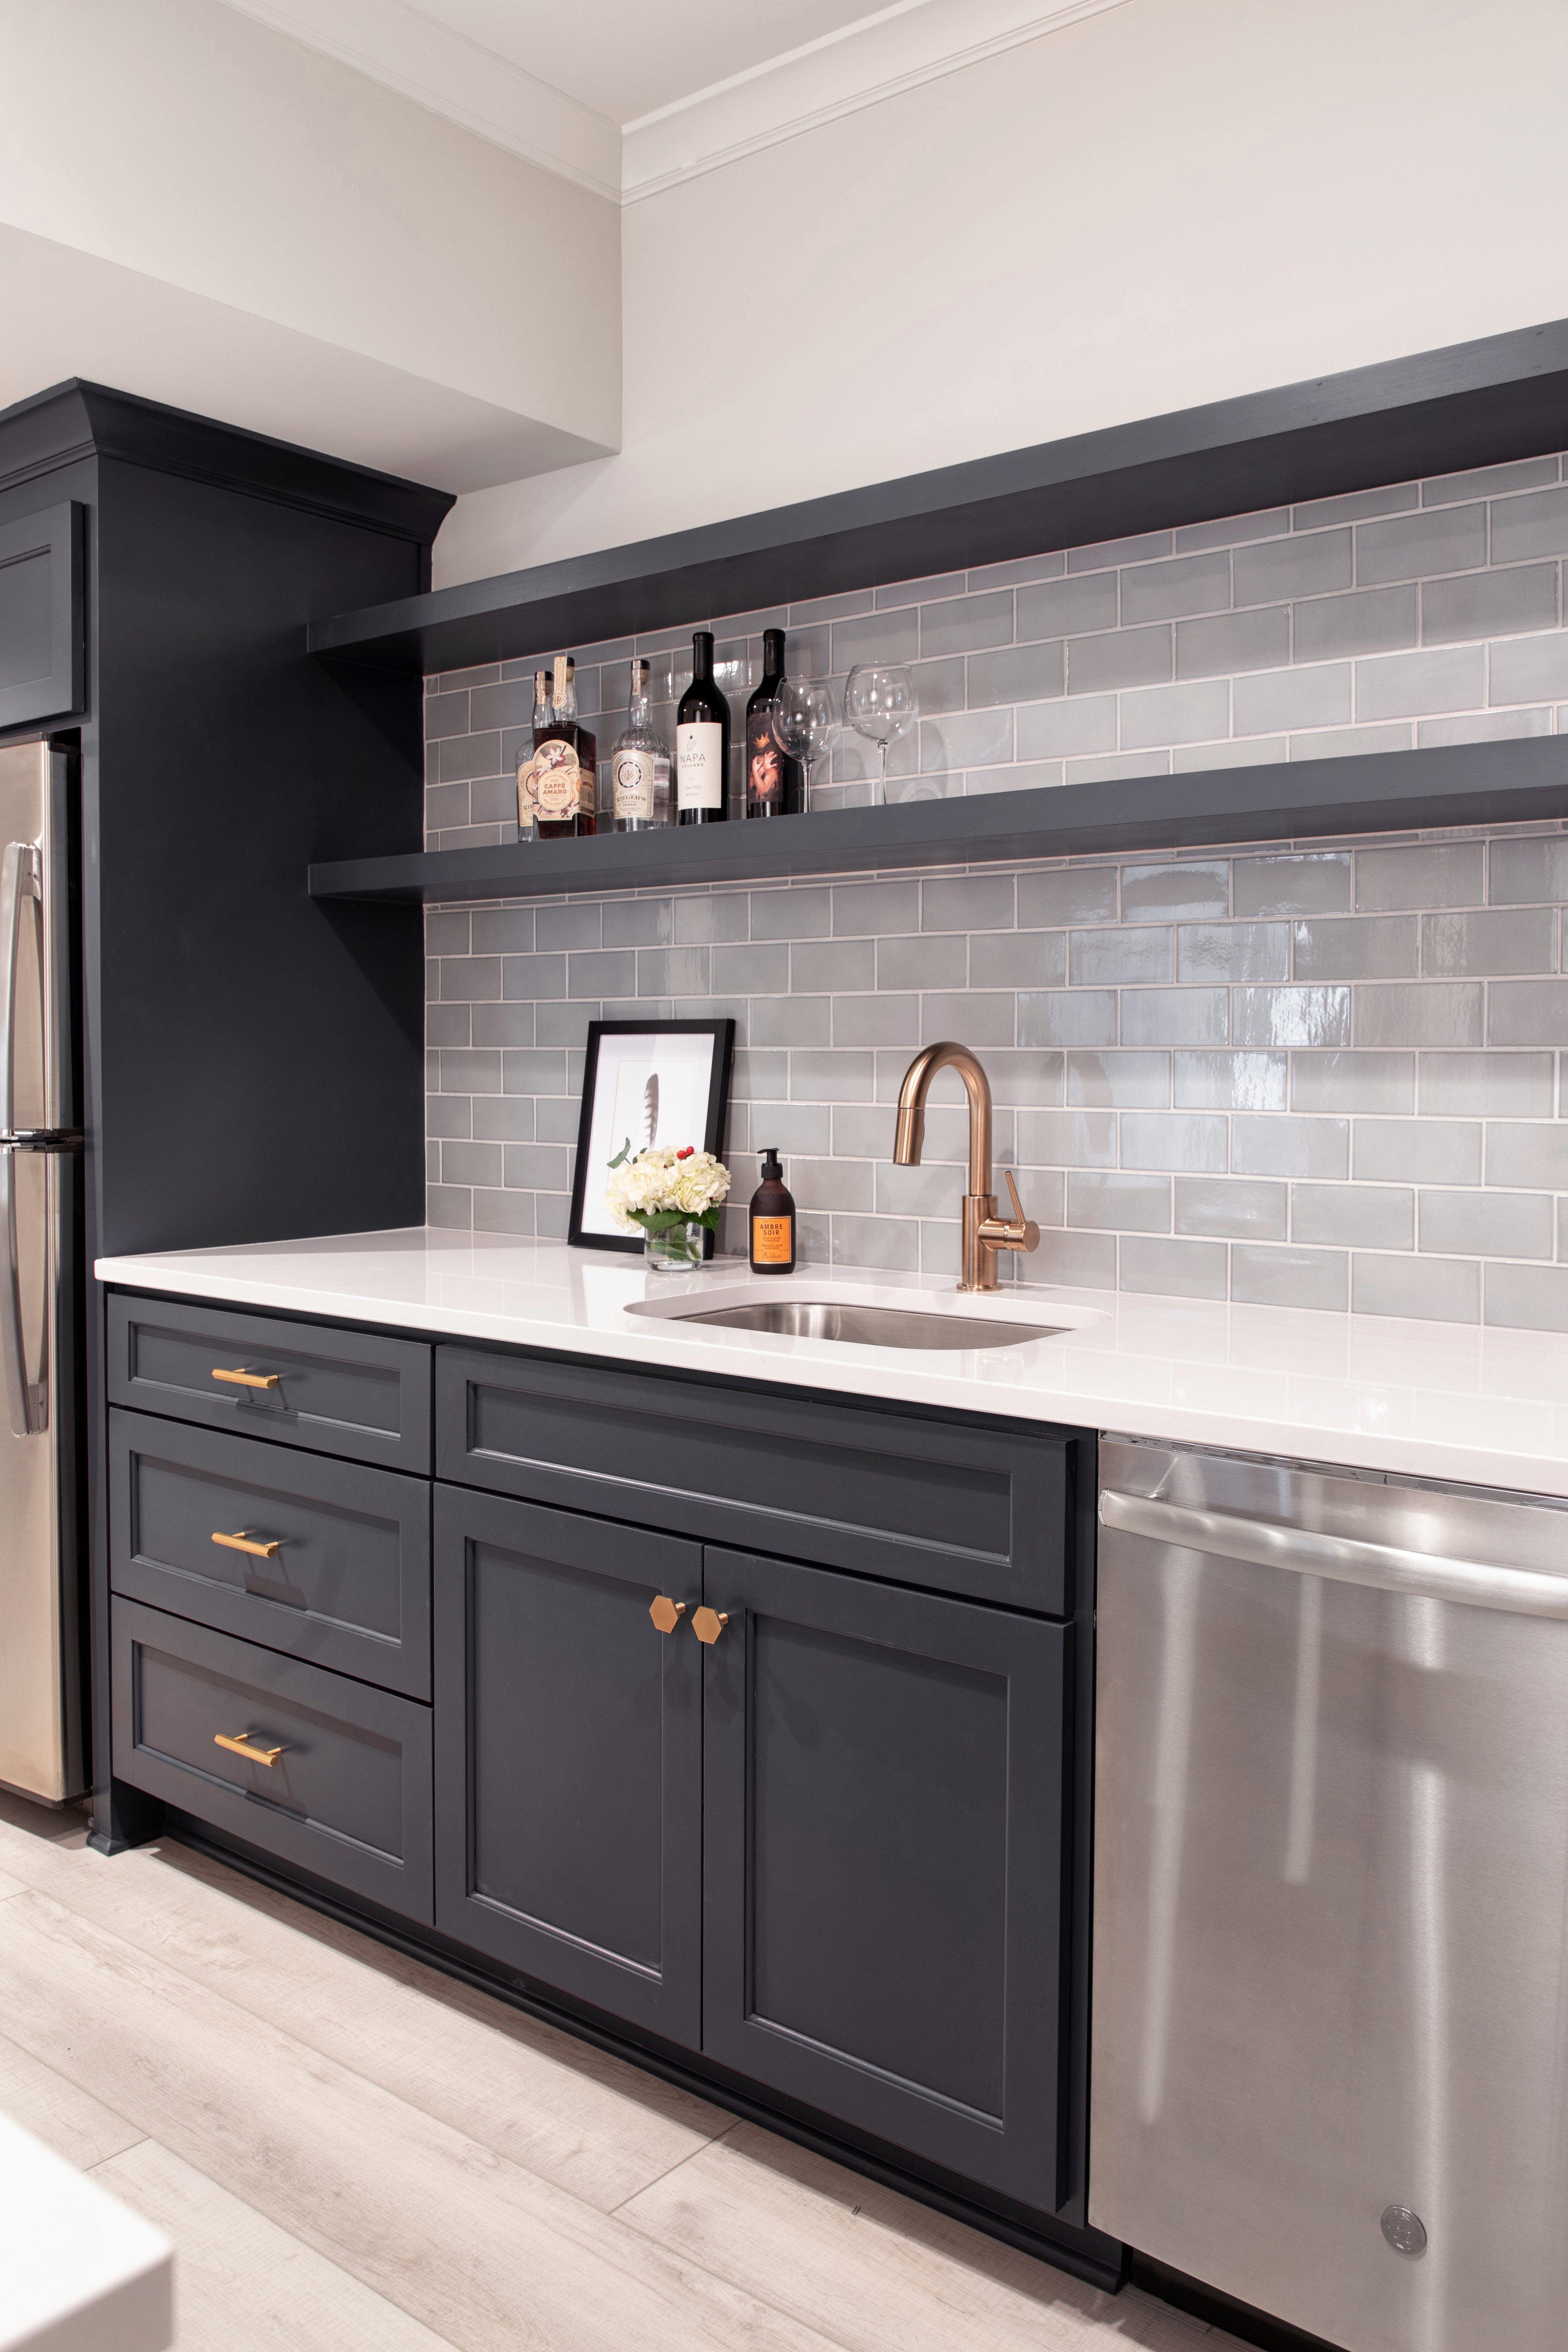 Basement Kitchen Blue Cabinets White Tile Backsplash Some Houses Have Basements And Sometimes It Is In 2020 Basement Kitchen Basement Makeover Basement Kitchenette